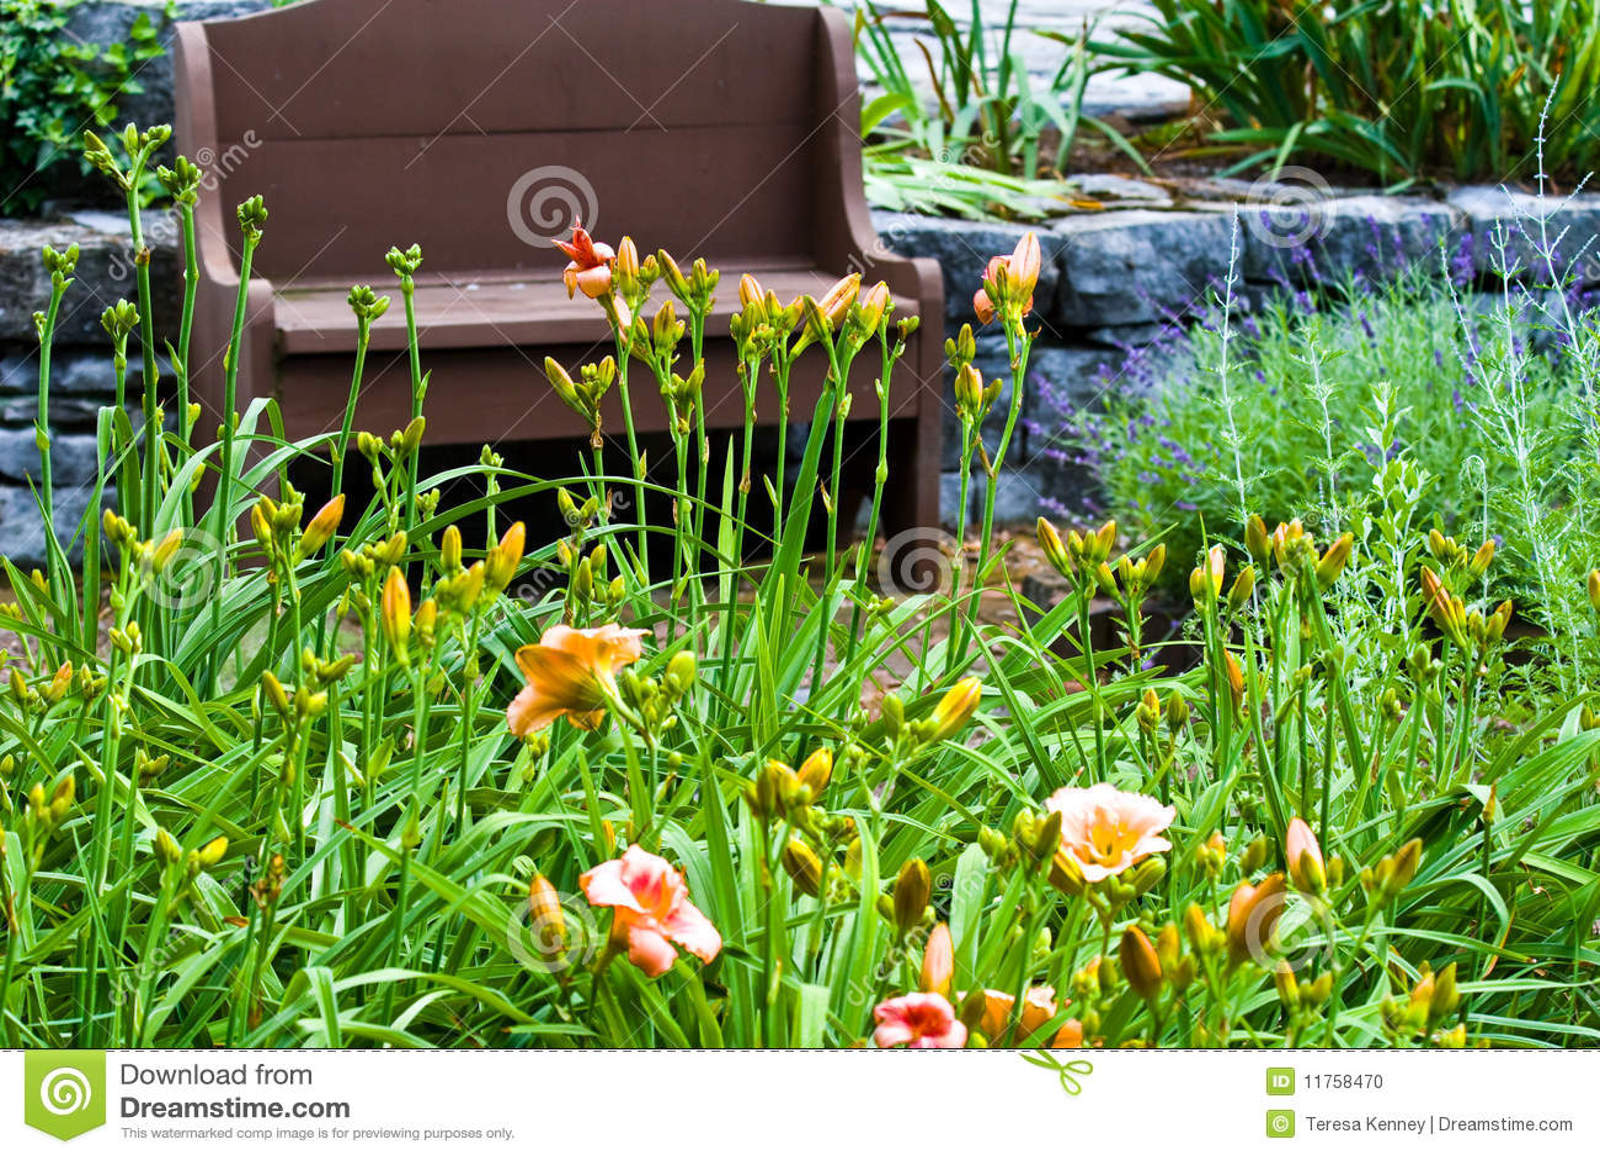 fotos jardins lindos : fotos jardins lindos:Foto de Stock: Jardins bonitos